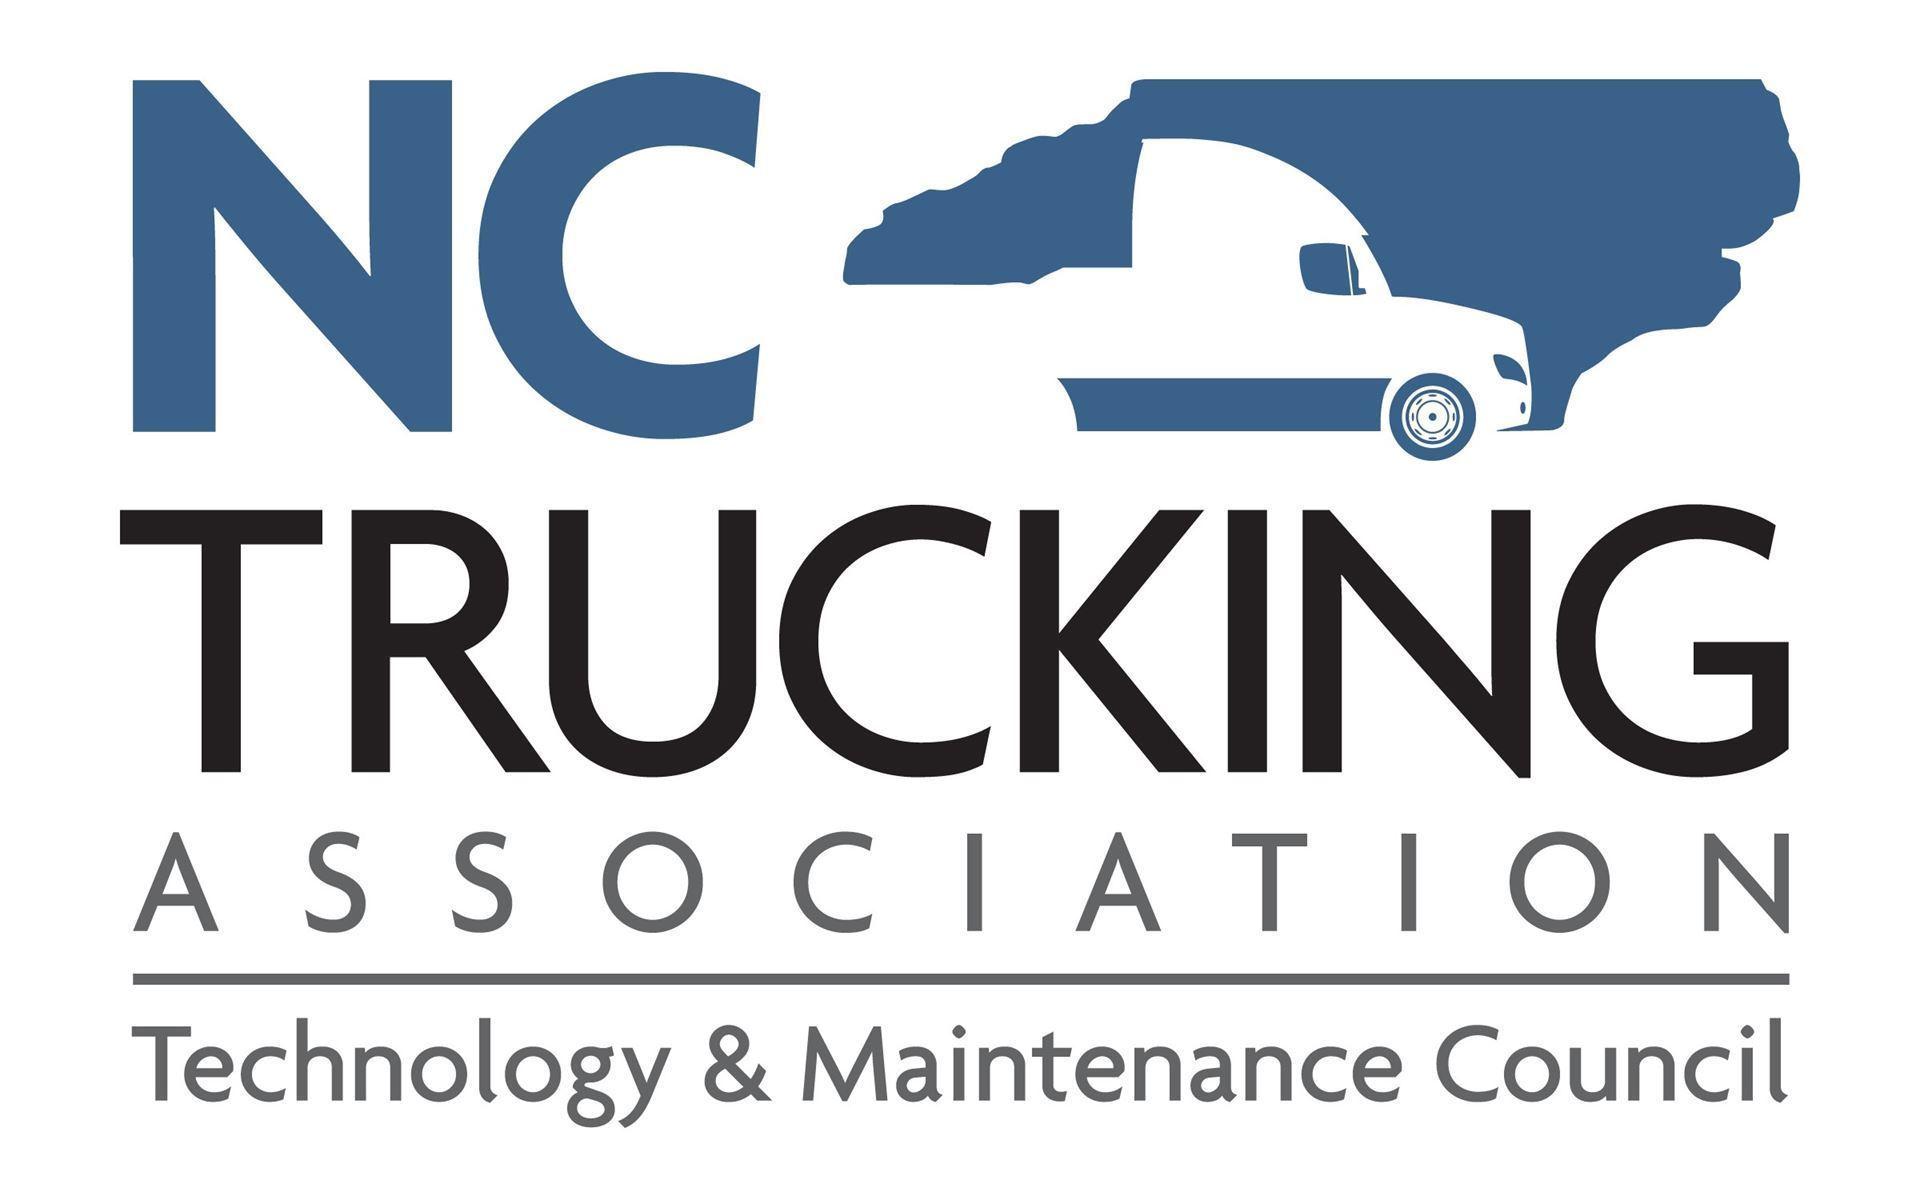 TMC Fleet Manager Meeting: 9/29/20 Hiring and Retaining Techs